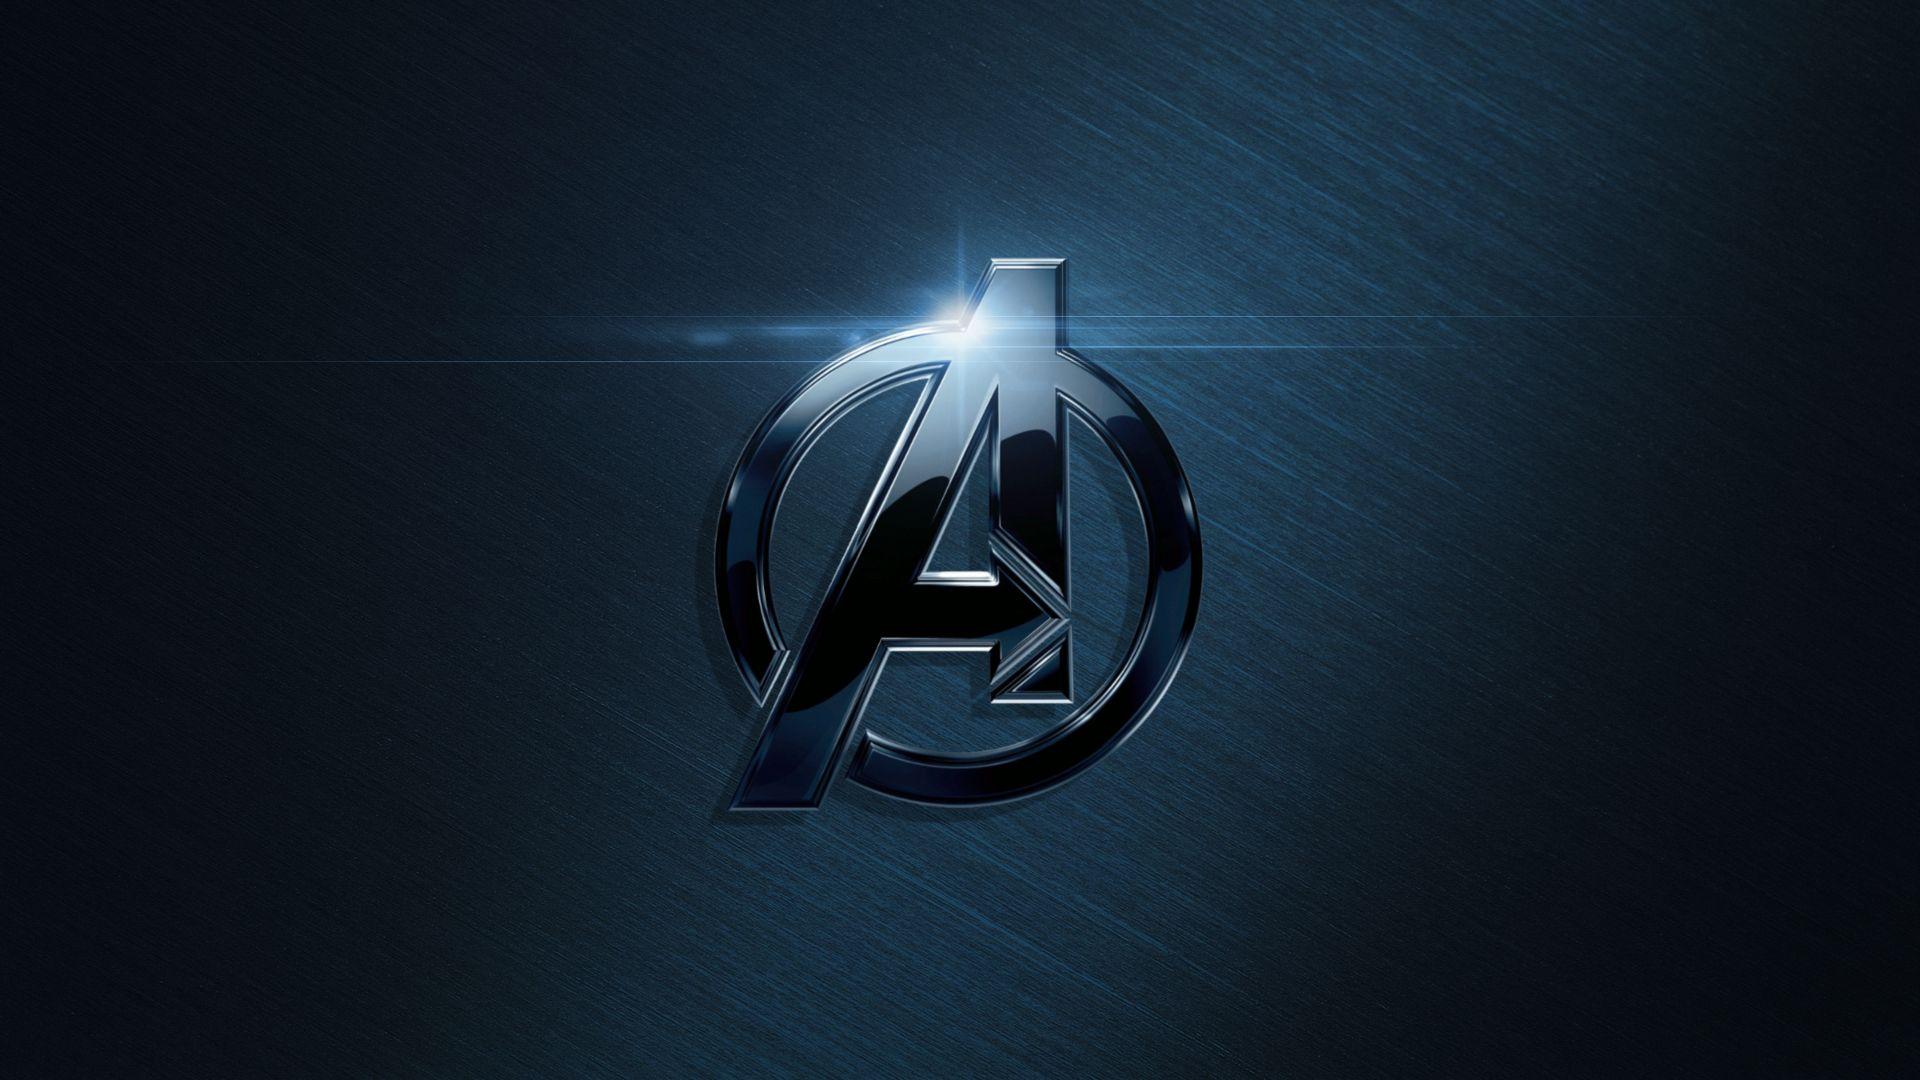 The Avengers Wallpapers, Movie, Best HD 1080p 17 | My nerd is showing | Avengers wallpaper ...